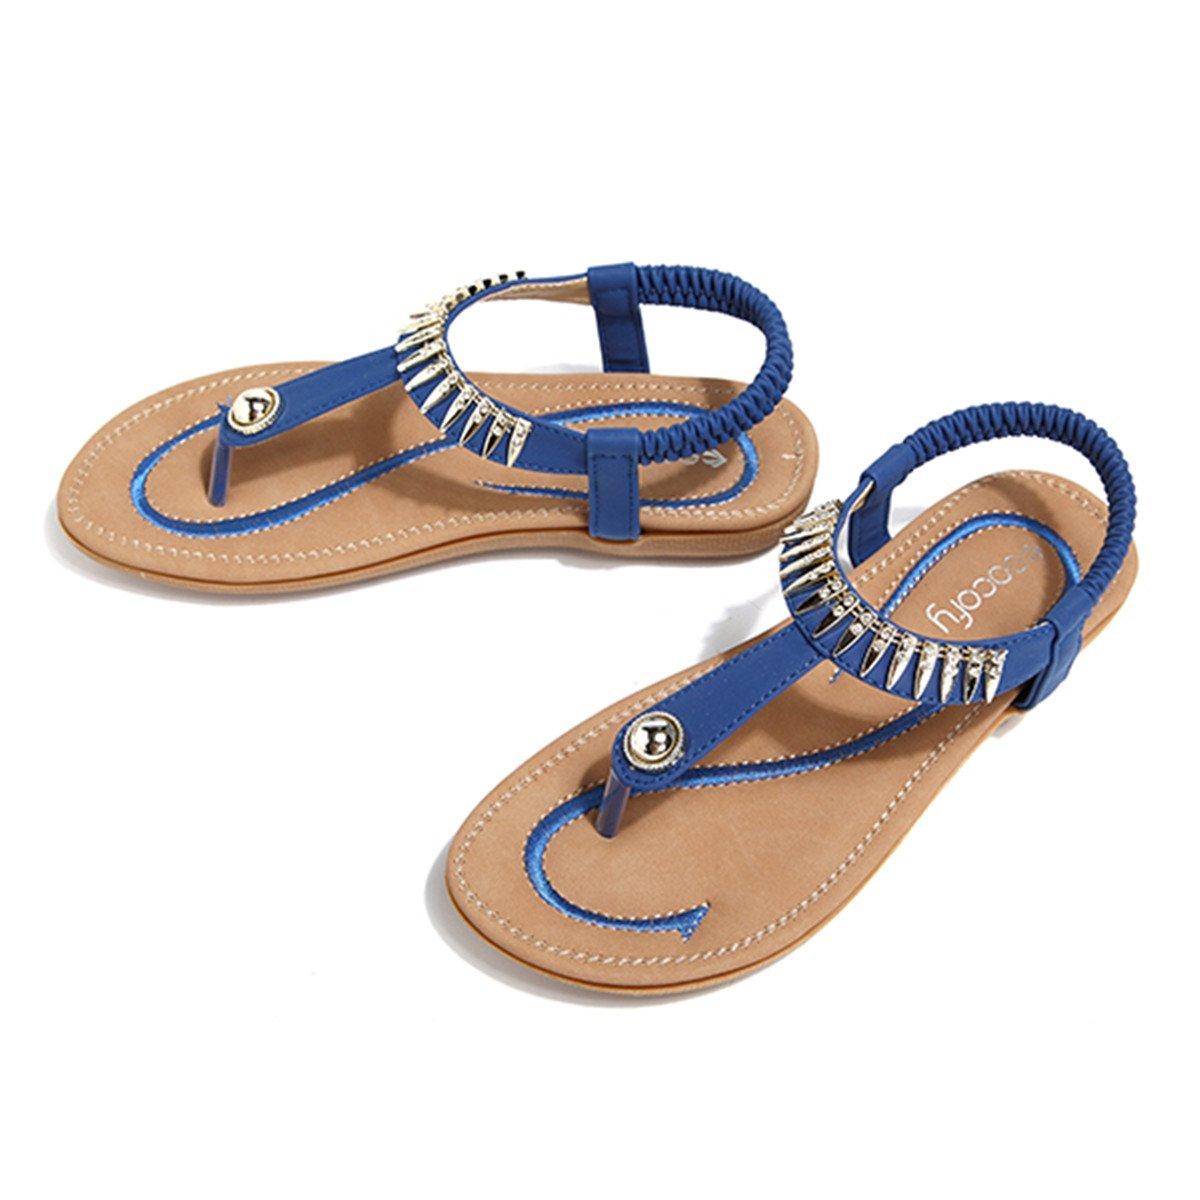 Socofy Bohemian Sandals,Women's Metal Elastic Flat Sandals Summer Bohemia Style Clip Toe Flip Flops Shoes Blue 9 B(M) US by Socofy (Image #4)